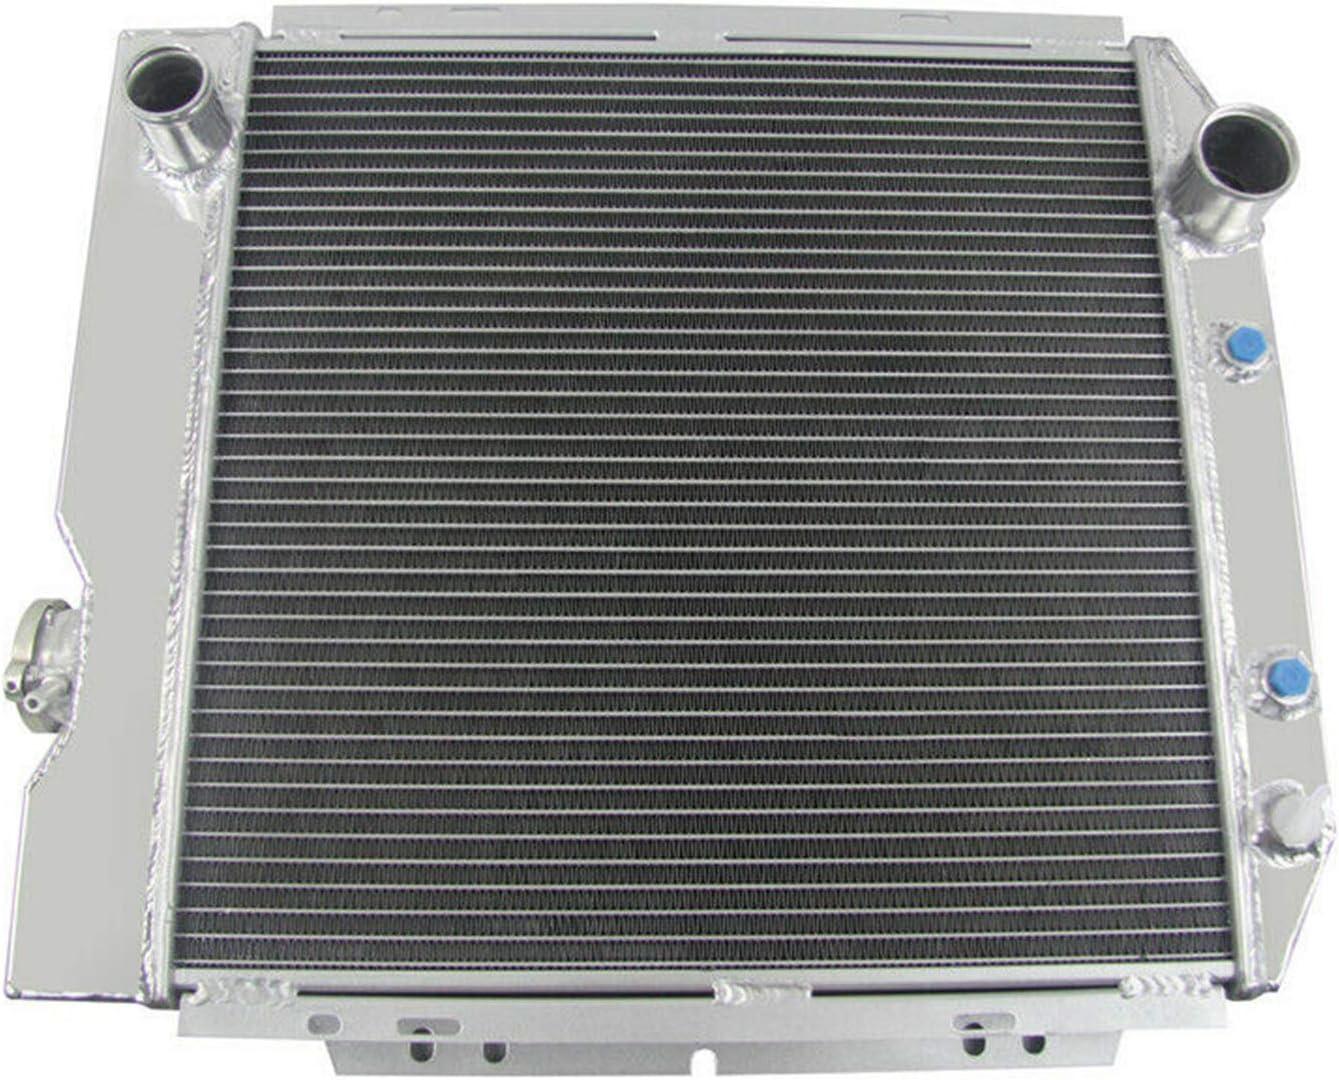 3Row Aluminum Radiator For 1964-1966 Ford Mustang 260 289 1965 V8 4.3L//4.7L+Fans